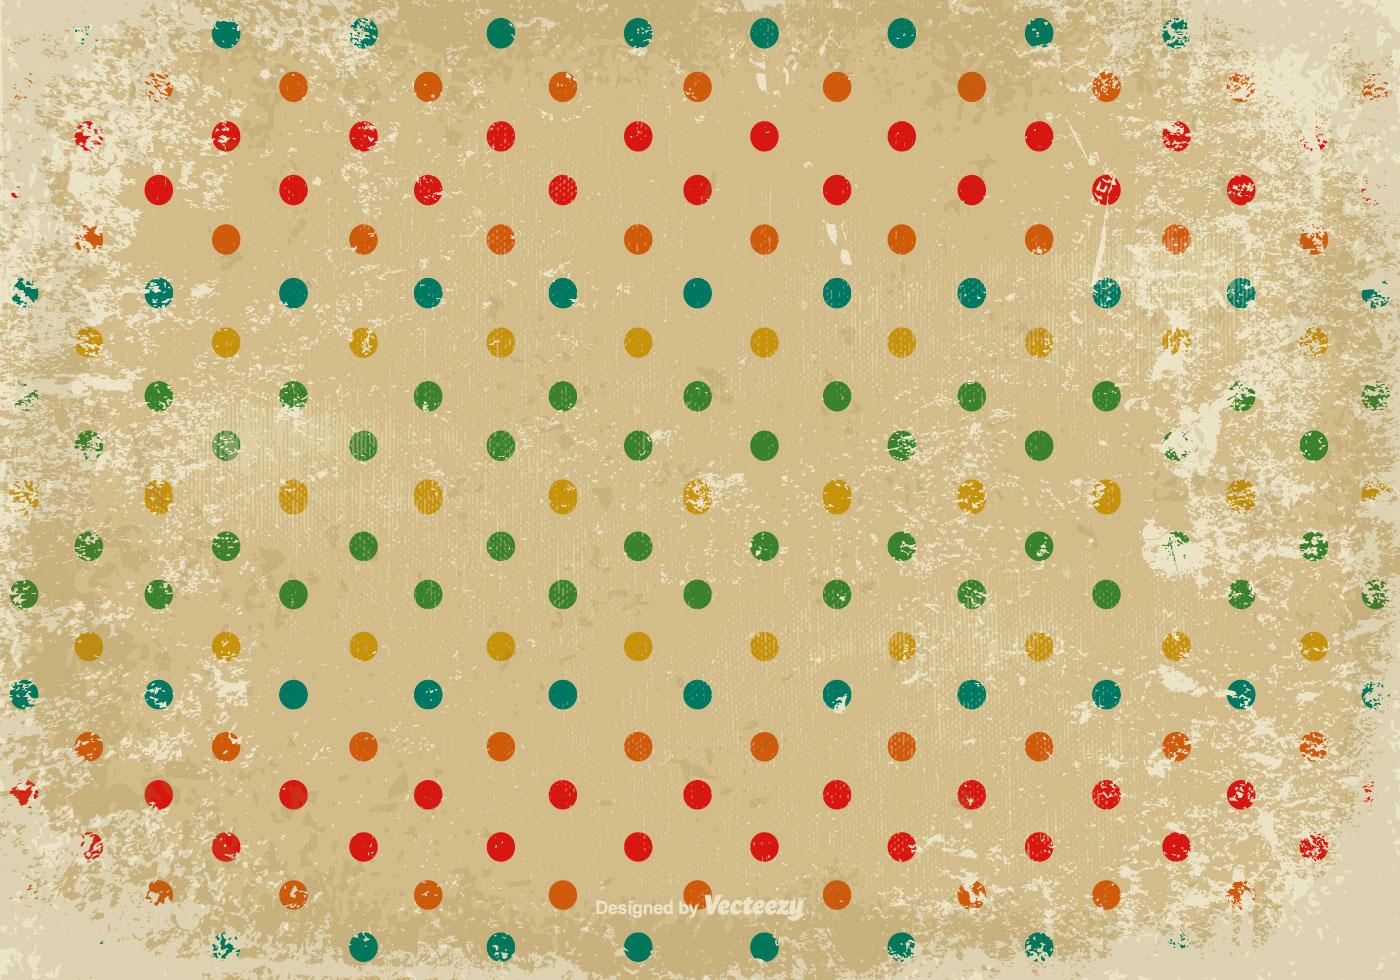 grunge polka dot vector background download free vector